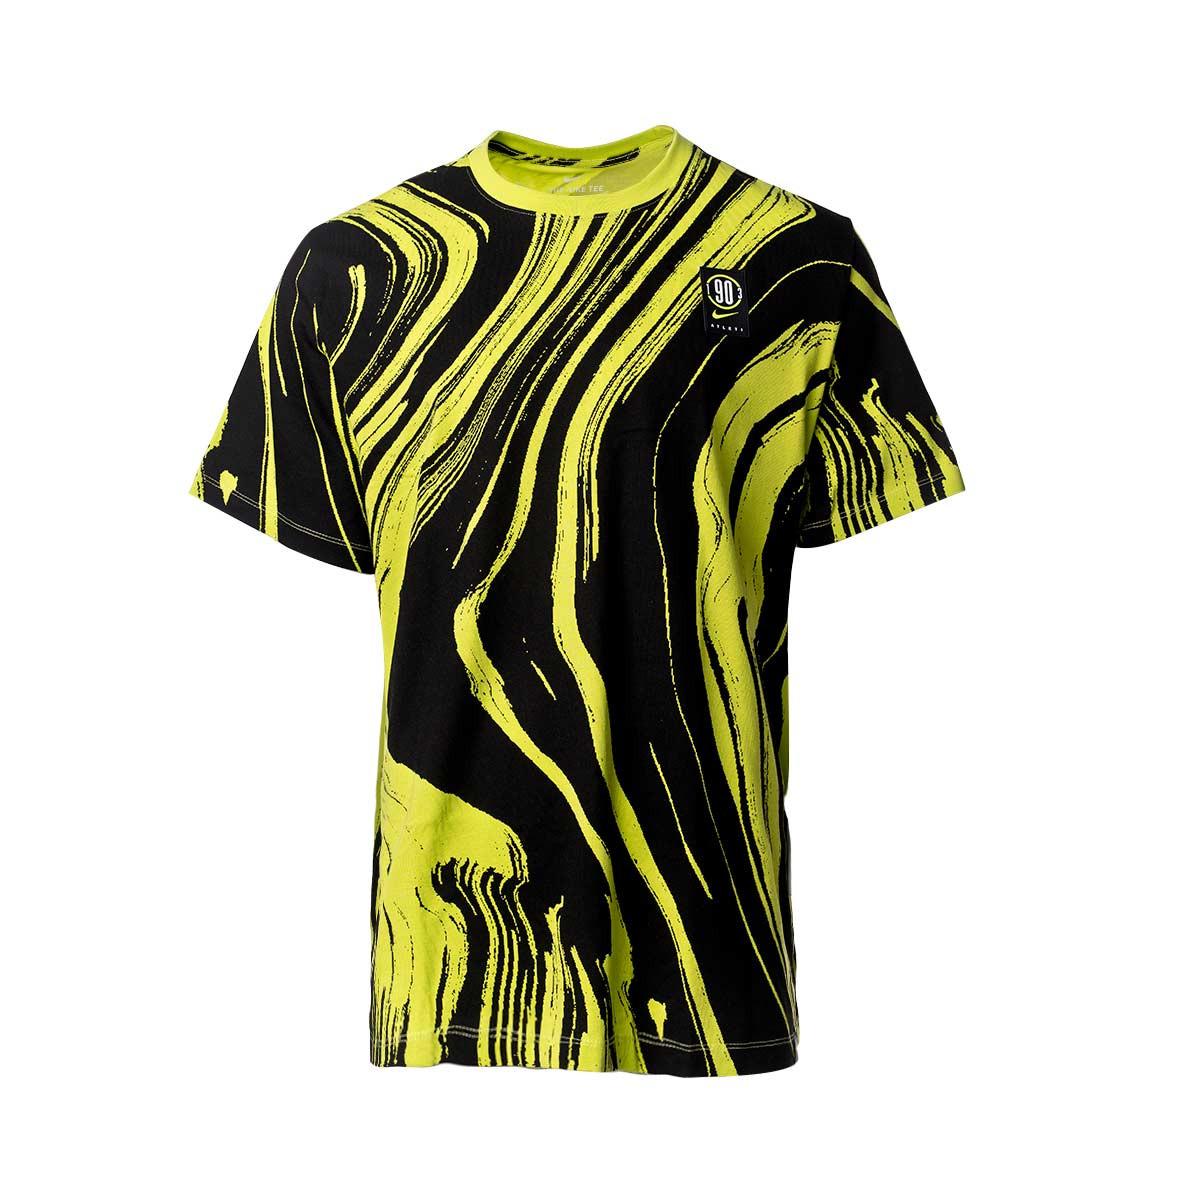 spugna giocatore Elaborare  Jersey Nike Atlético de Madrid Travel 2020-2021 Cyber - Football store  Fútbol Emotion